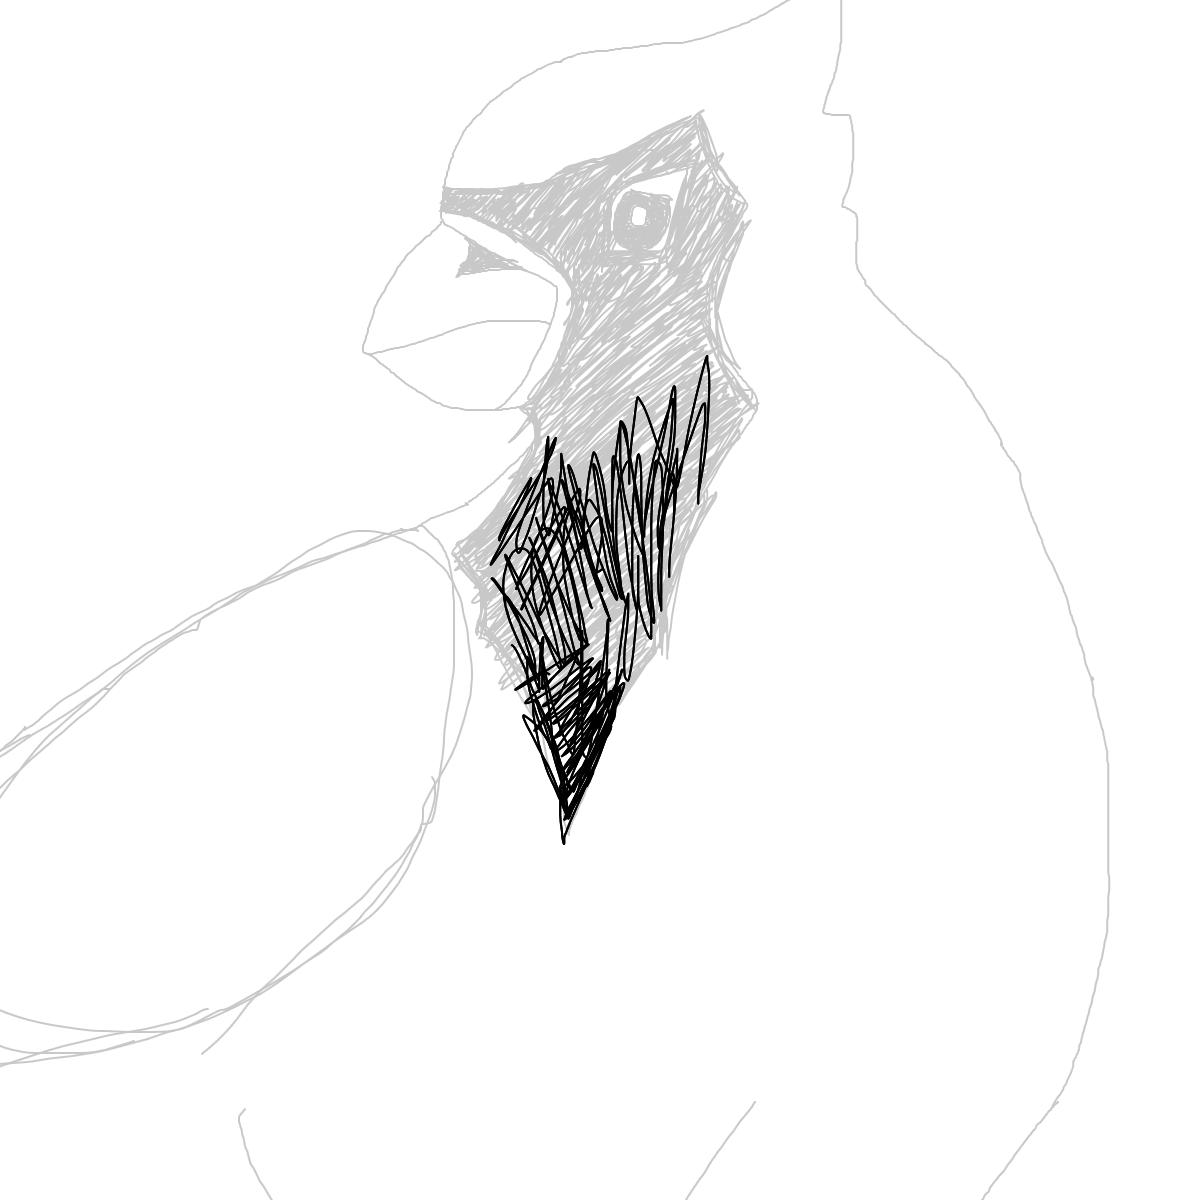 BAAAM drawing#23365 lat:41.9478454589843750lng: -87.6557922363281200